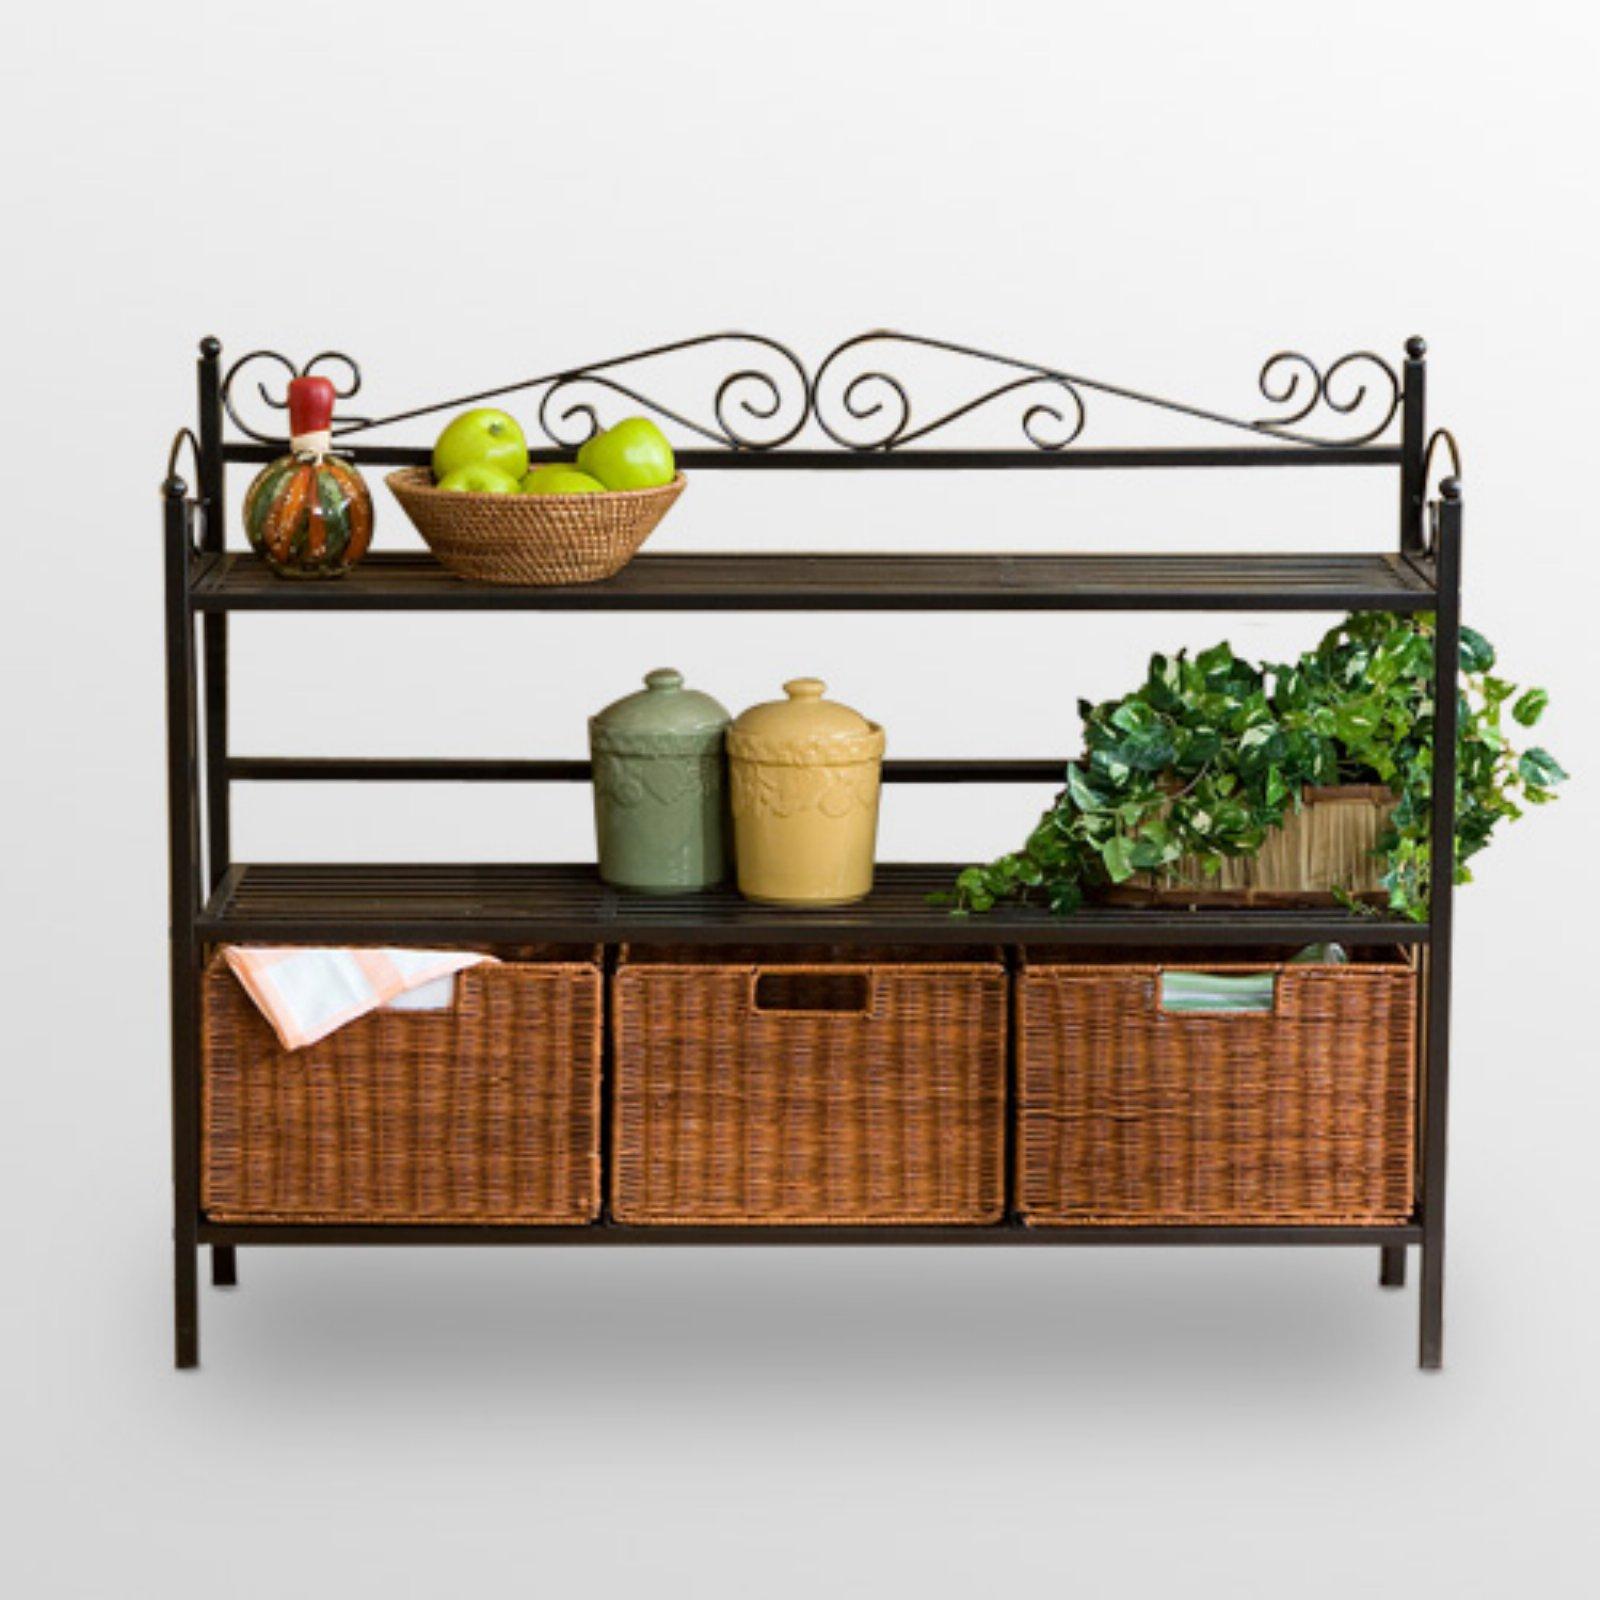 Low Celtic Kitchen Storage Unit with Baskets